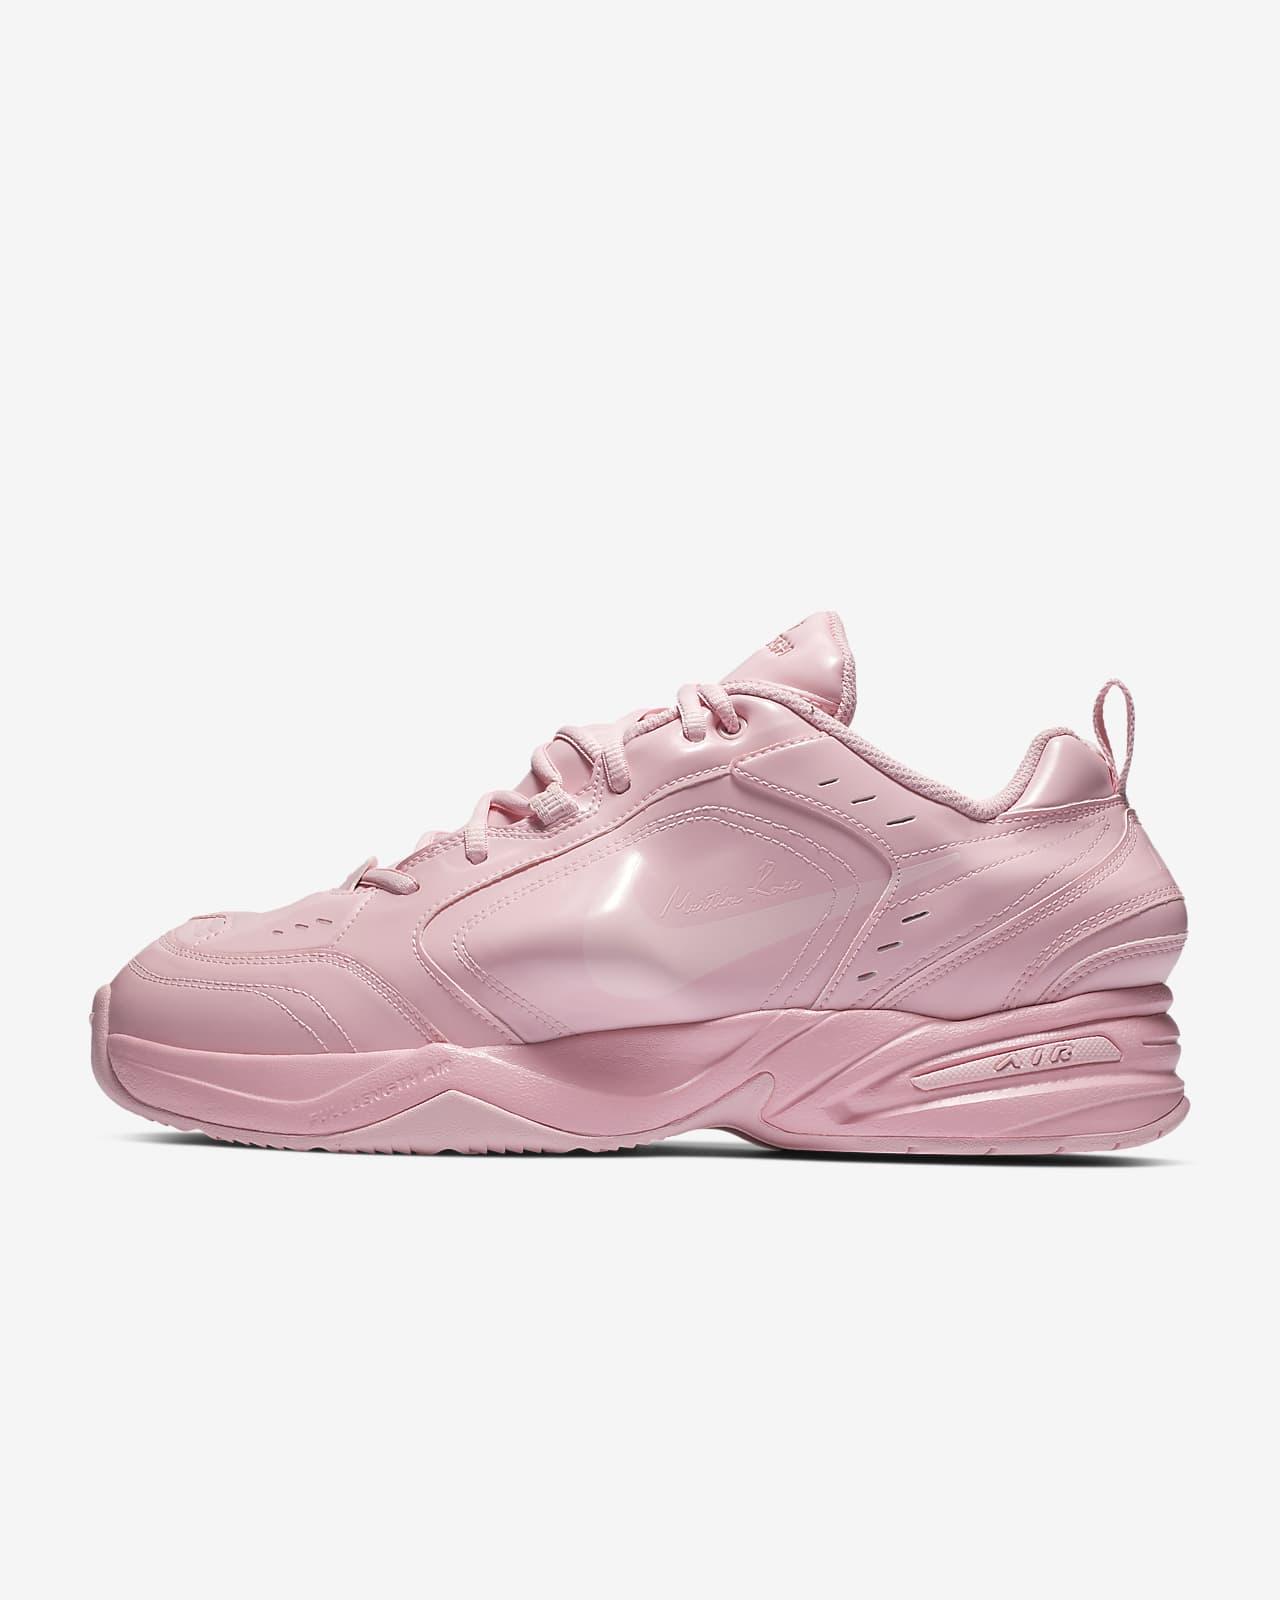 Nike Air Monarch IV / Martine Rose男/女运动鞋